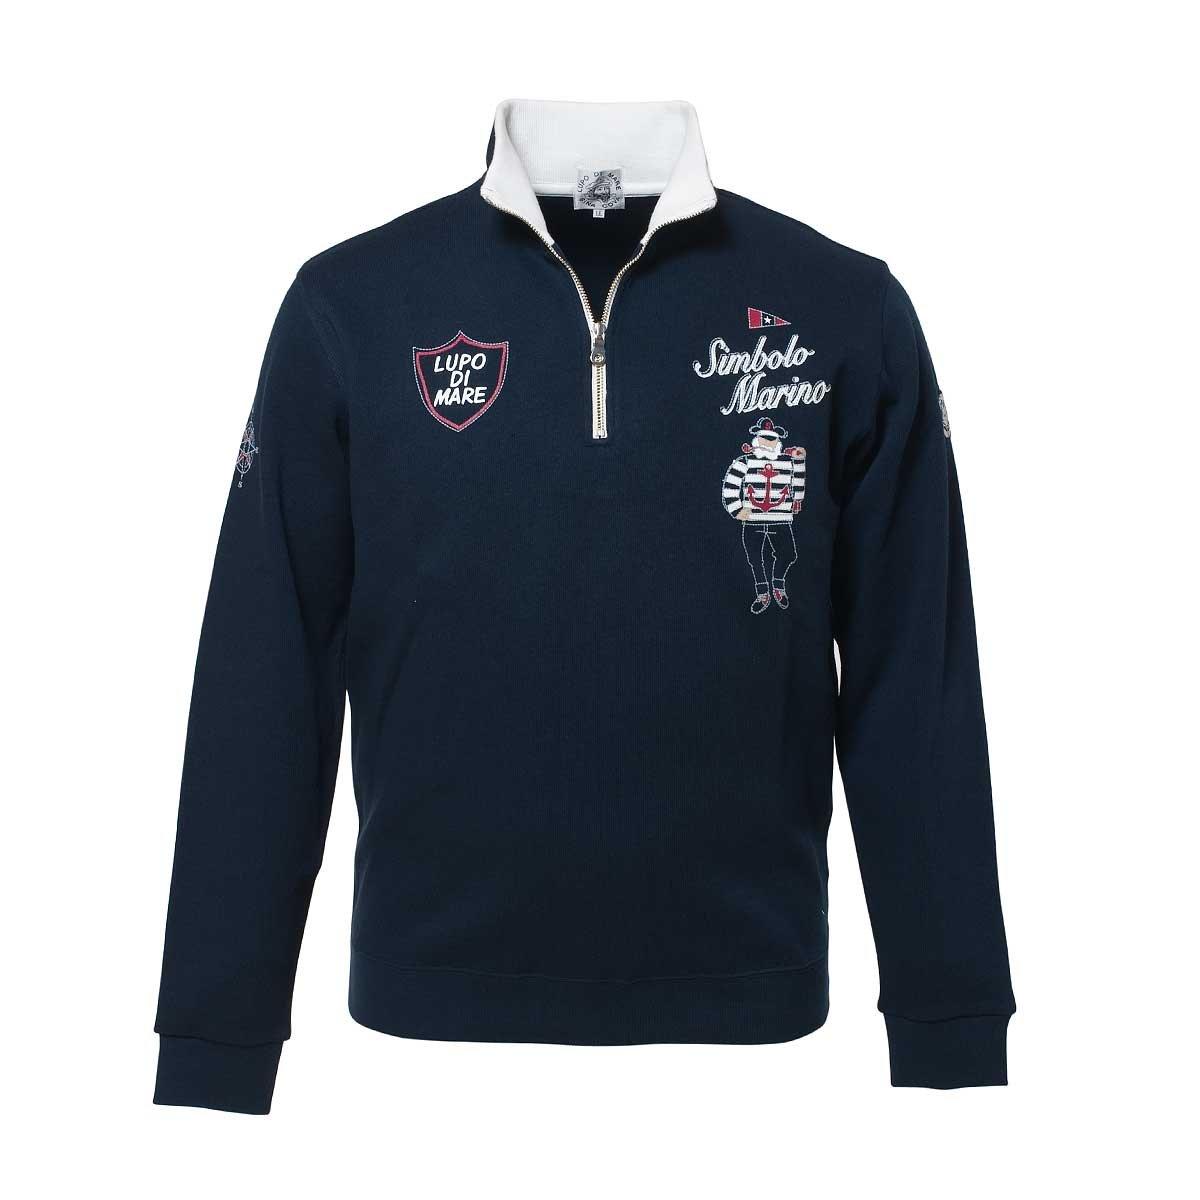 SINACOVA Men's sweatshirt Navy X-Large by SINA COVA